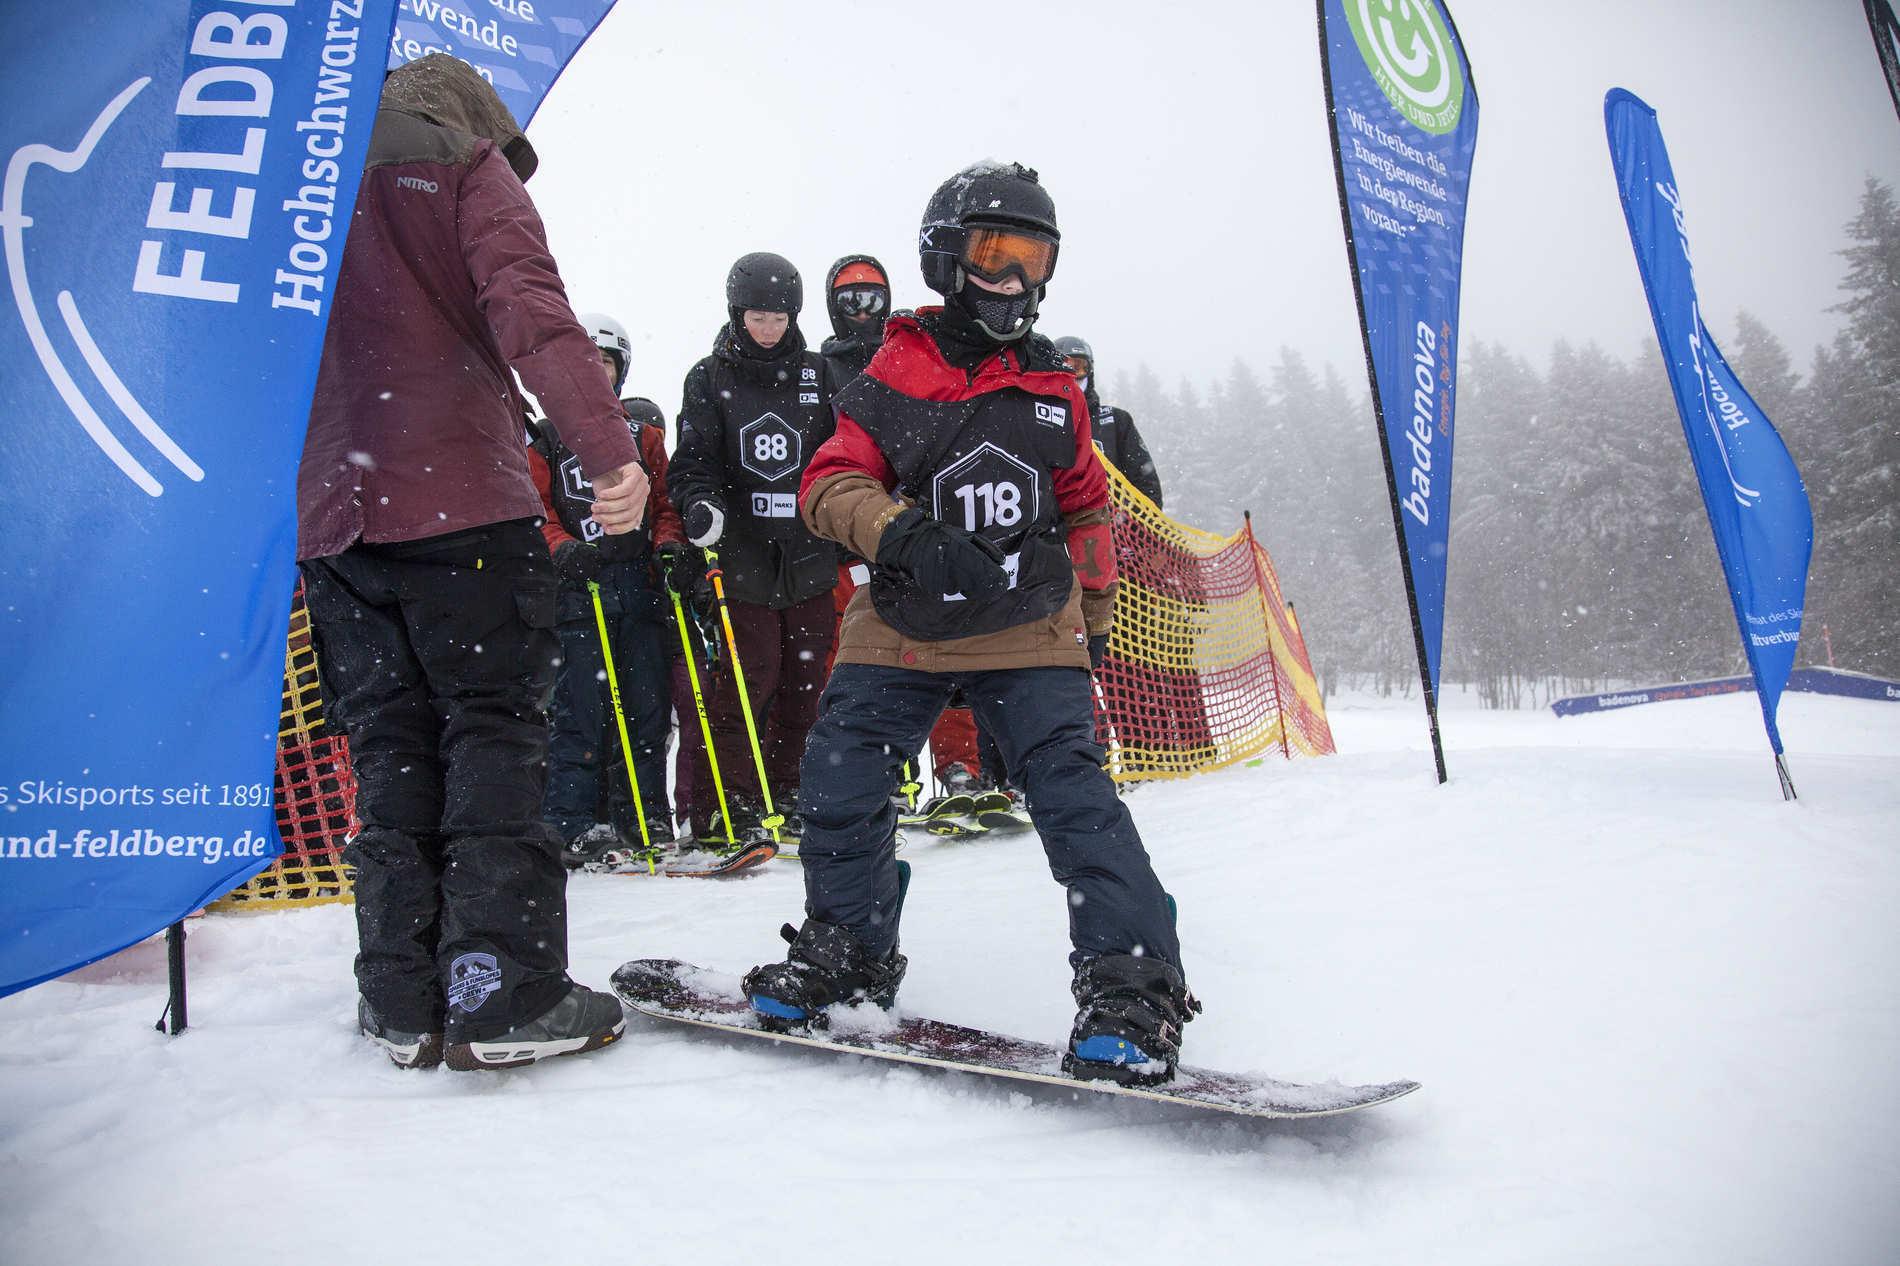 web snowpark feldberg 17 02 2018 lifestyle fs sb martin herrmann qparks 75